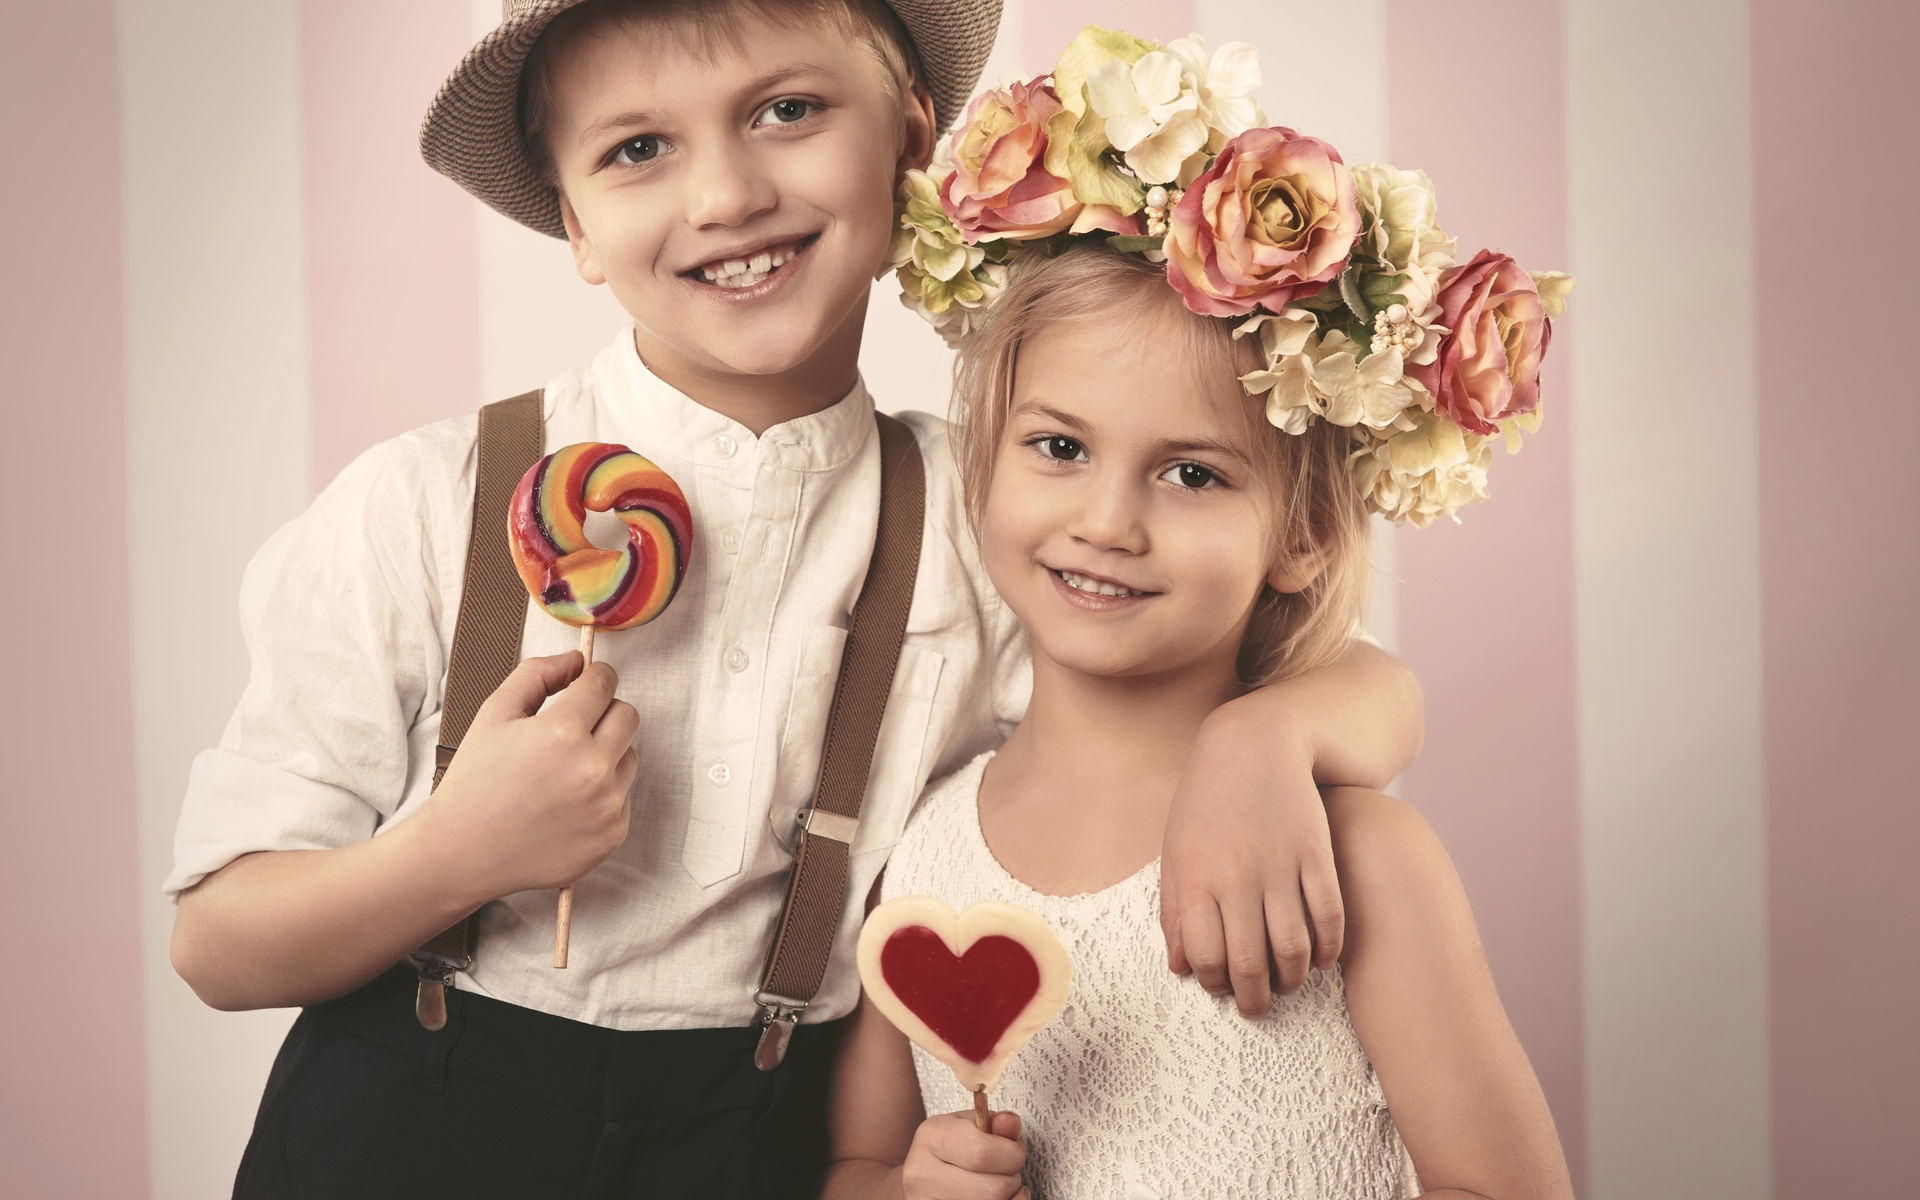 Луна картинки, картинки дети с конфетами